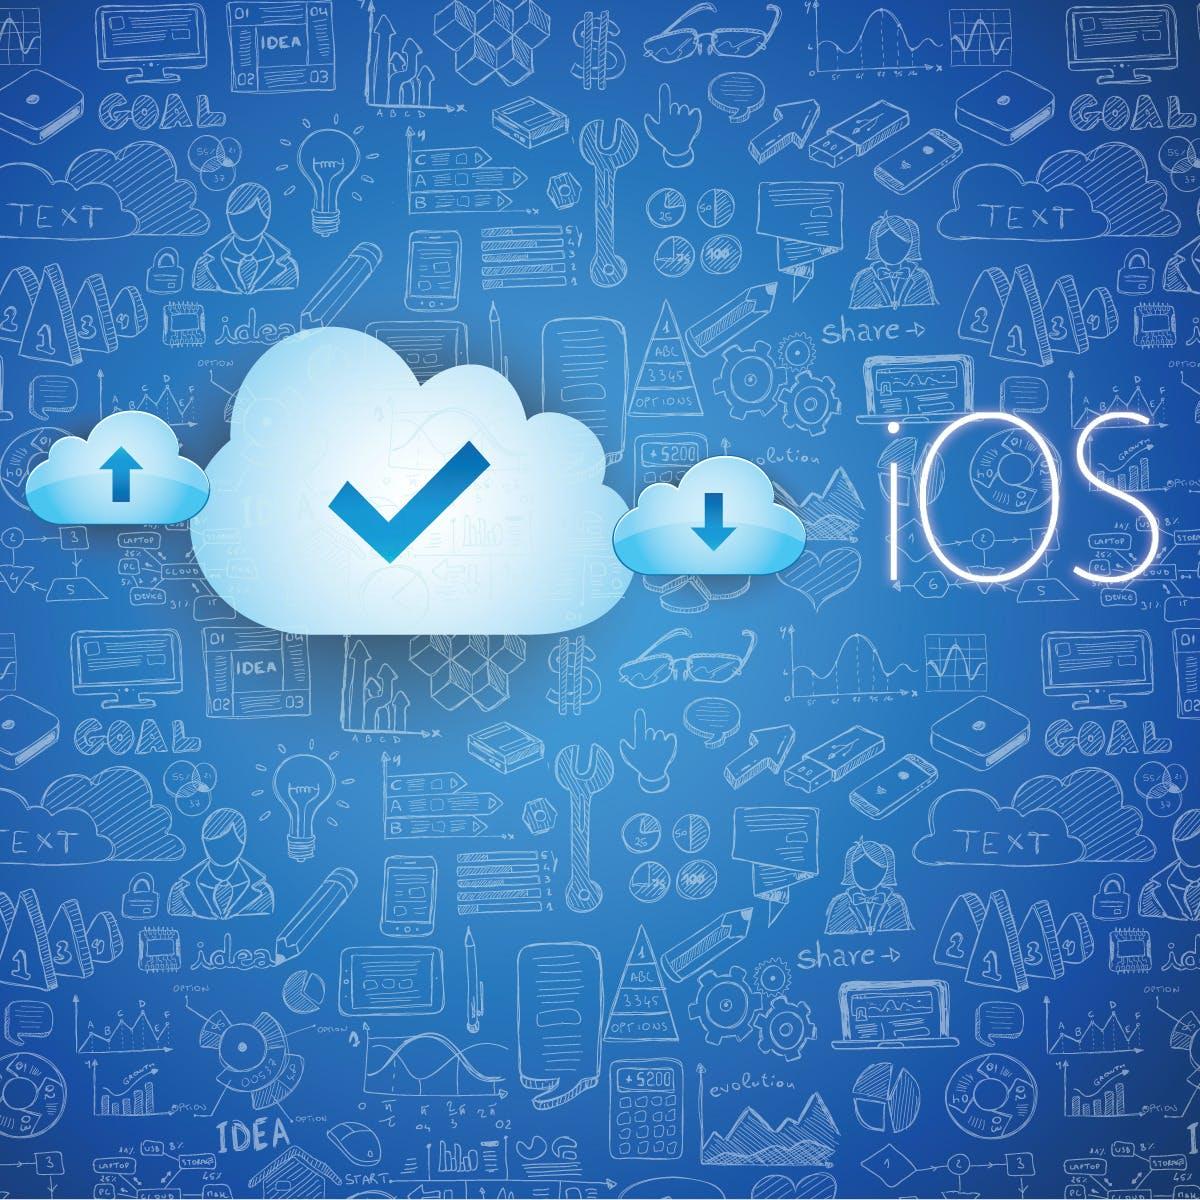 Accediendo a la nube con iOS